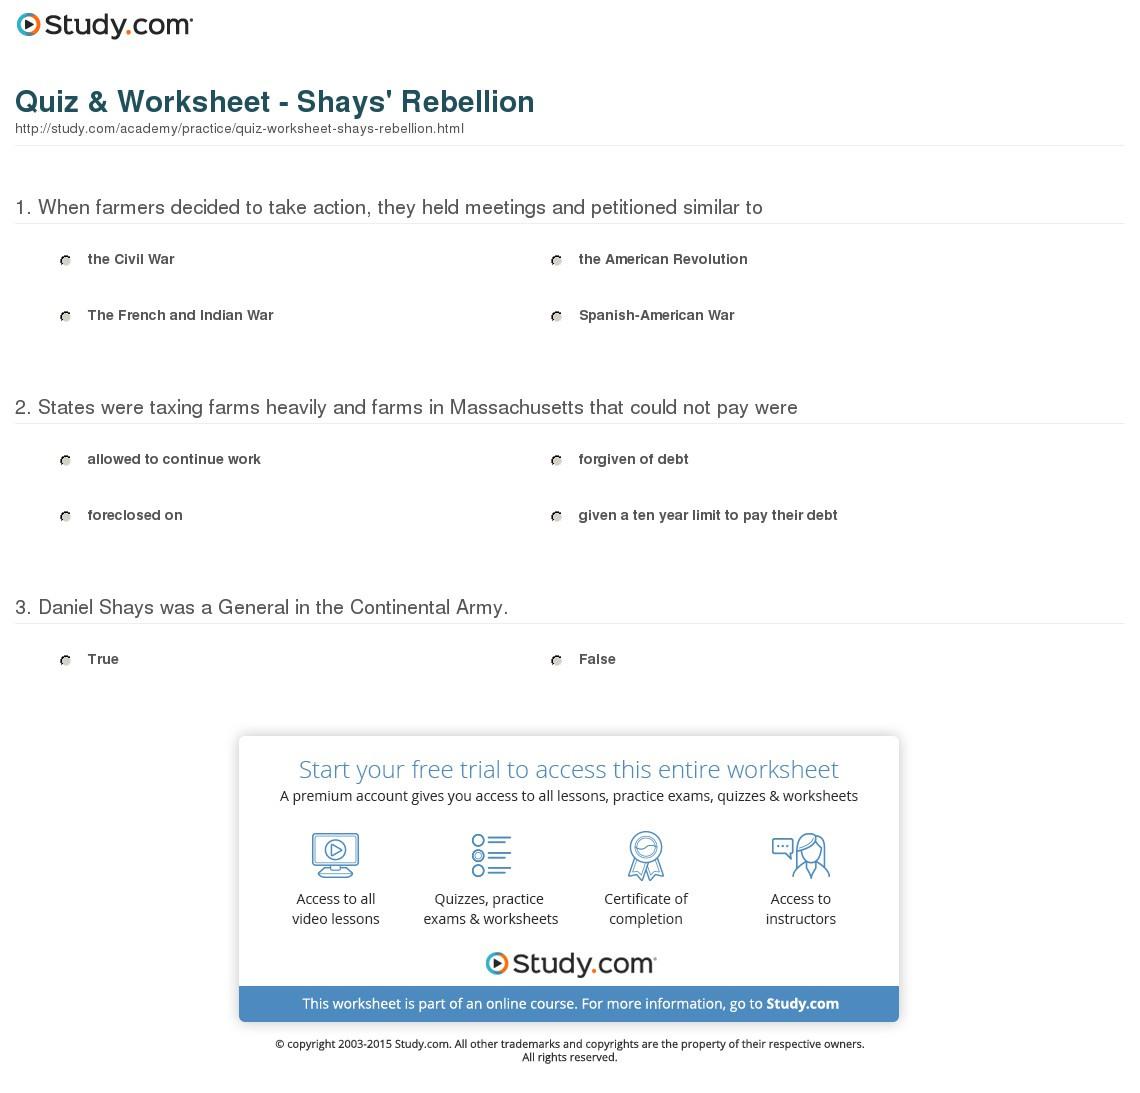 Shays Rebellion Worksheet Answers